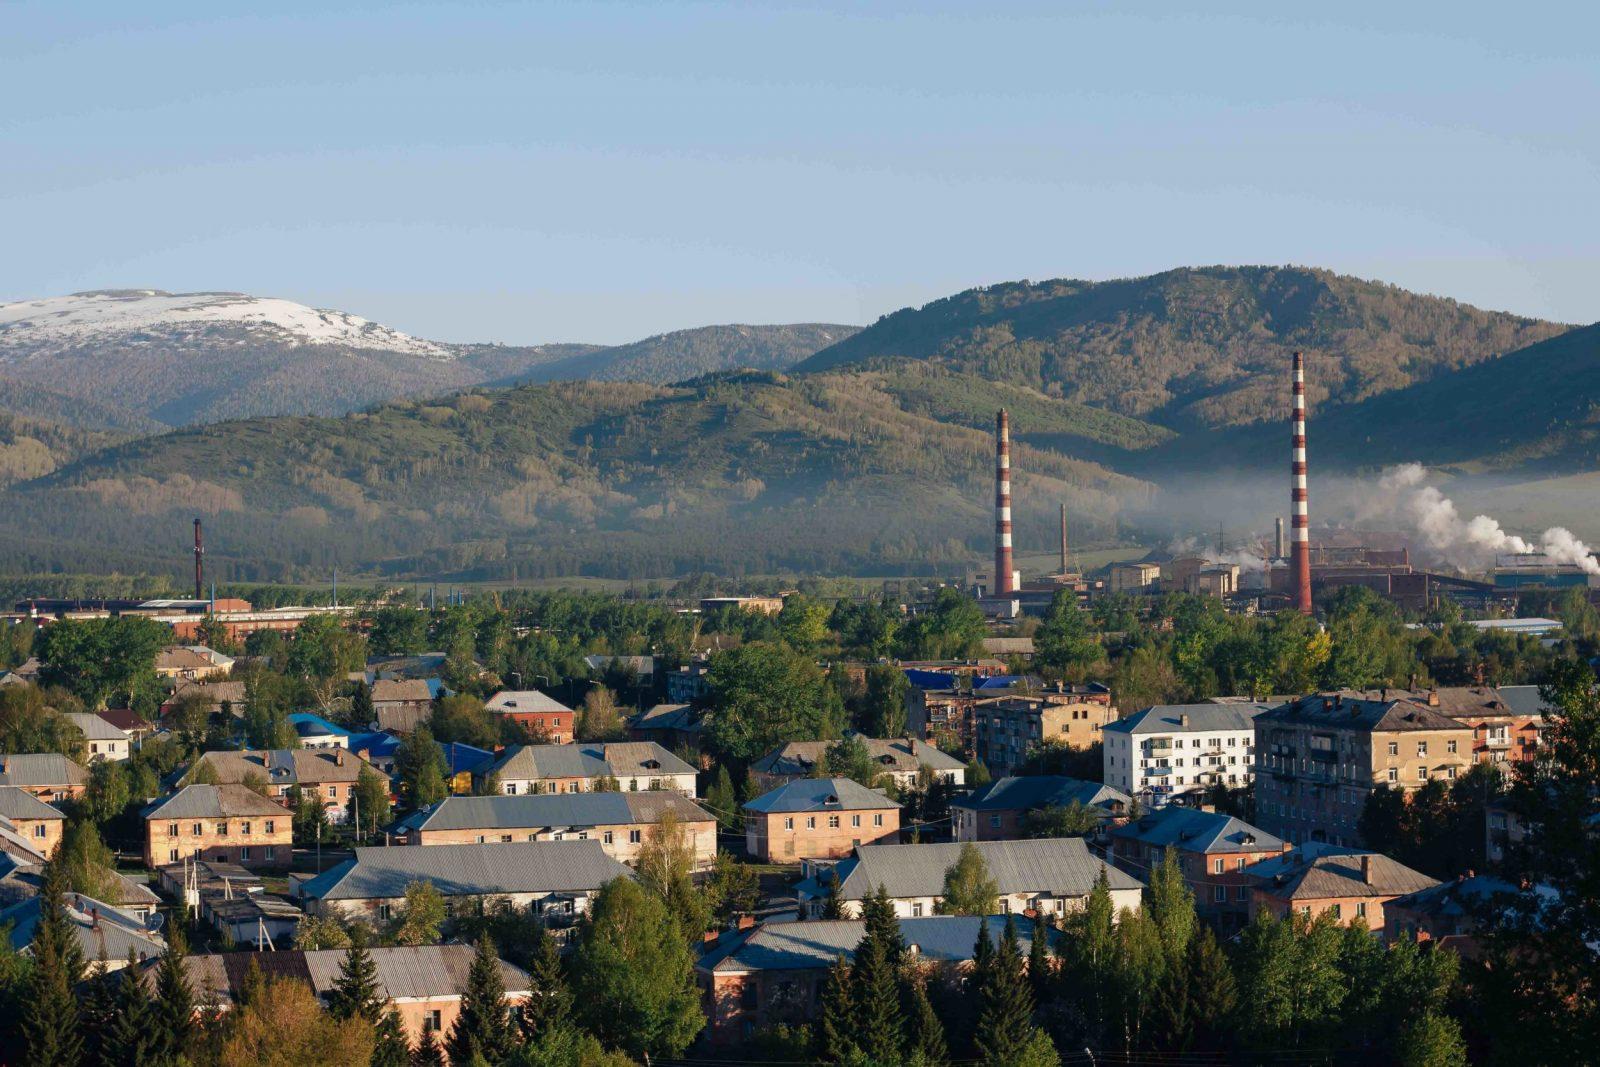 Вид с Соколка на город и цинковый завод. Утро